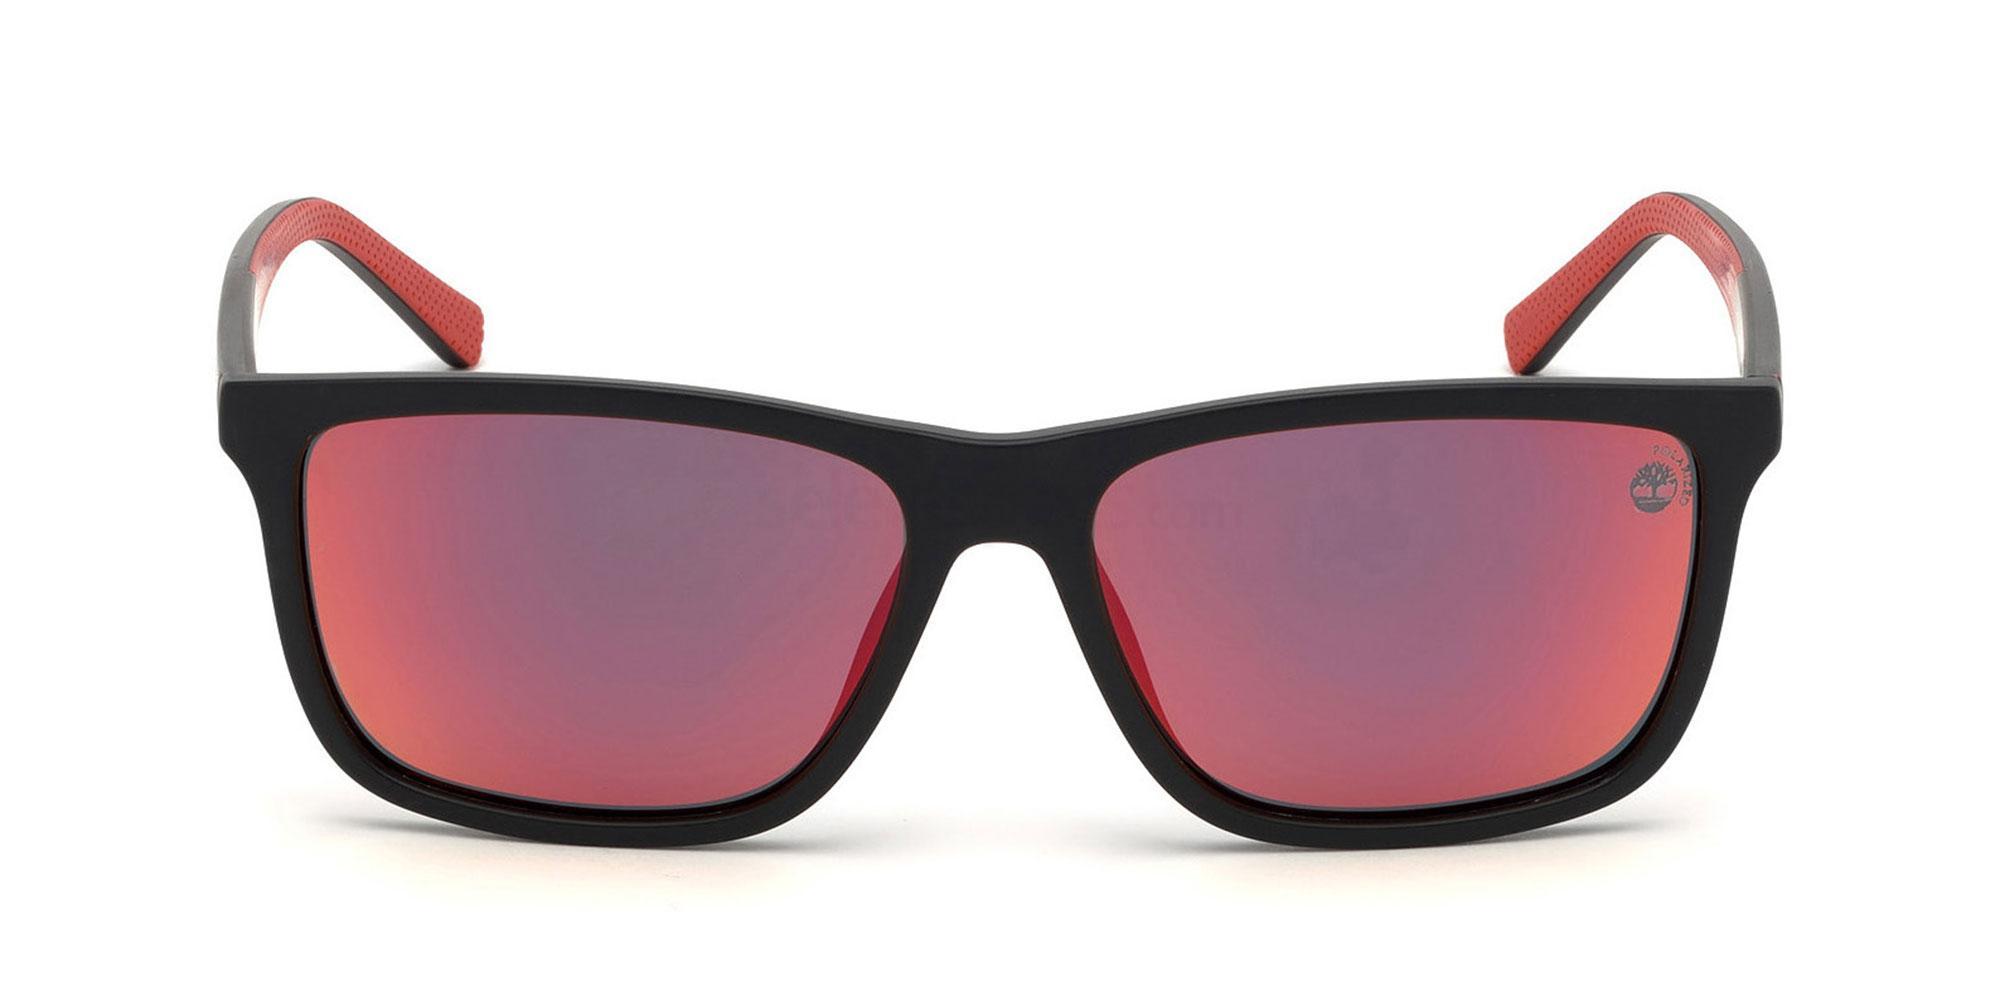 02D TB9174 Sunglasses, Timberland